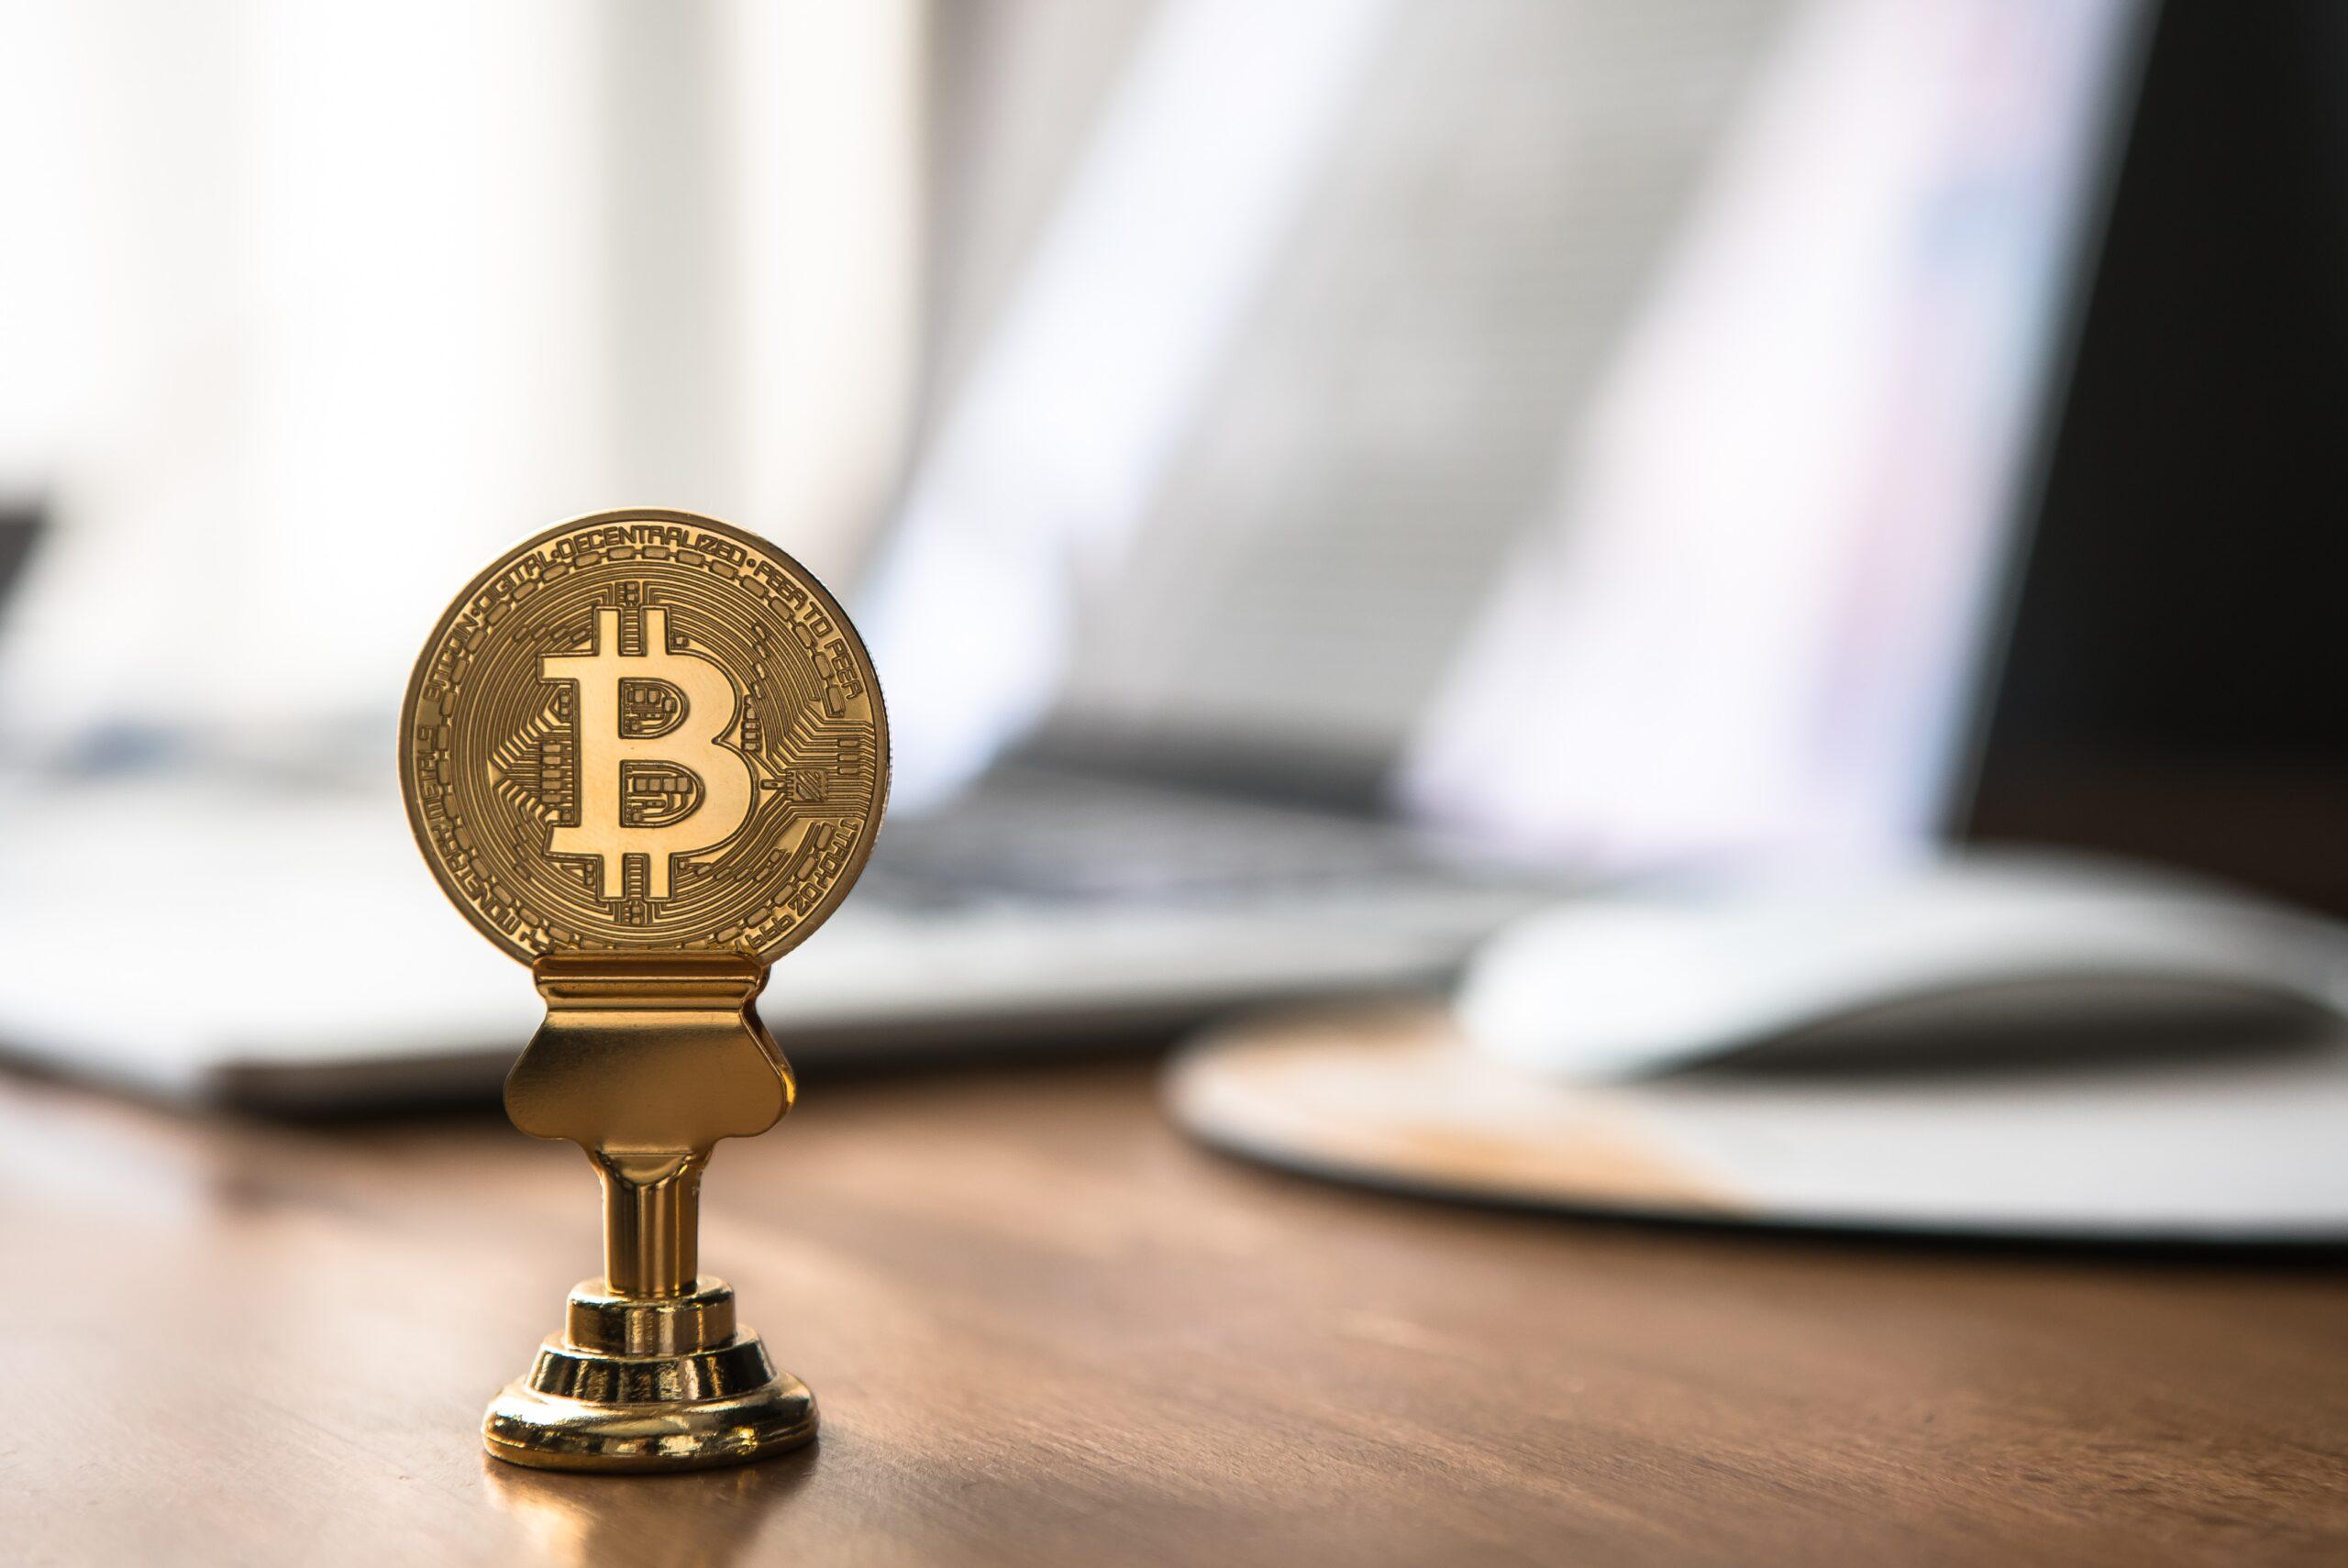 Virtual Financial Assets Act, 2018